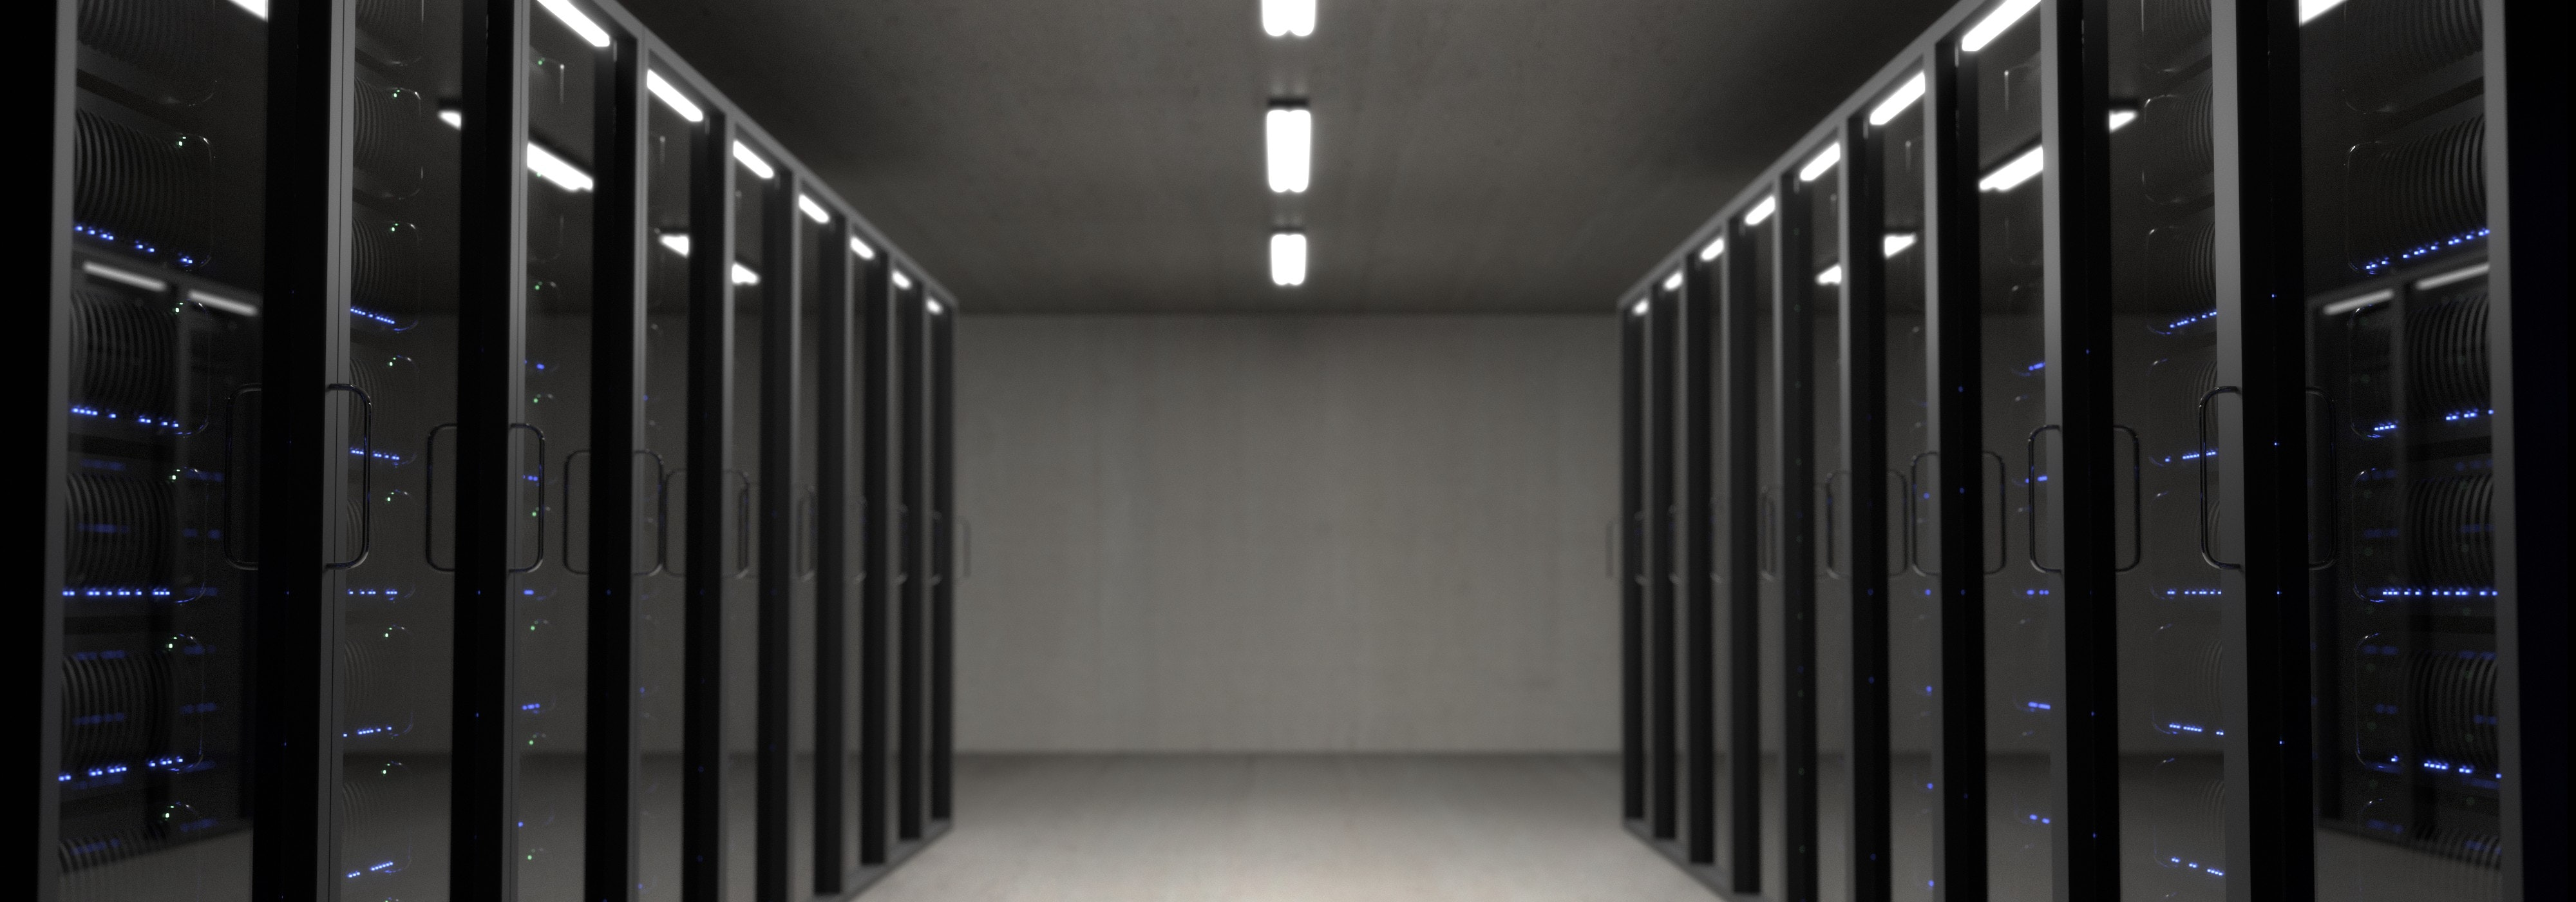 Server room. Facebook and Google Censor People